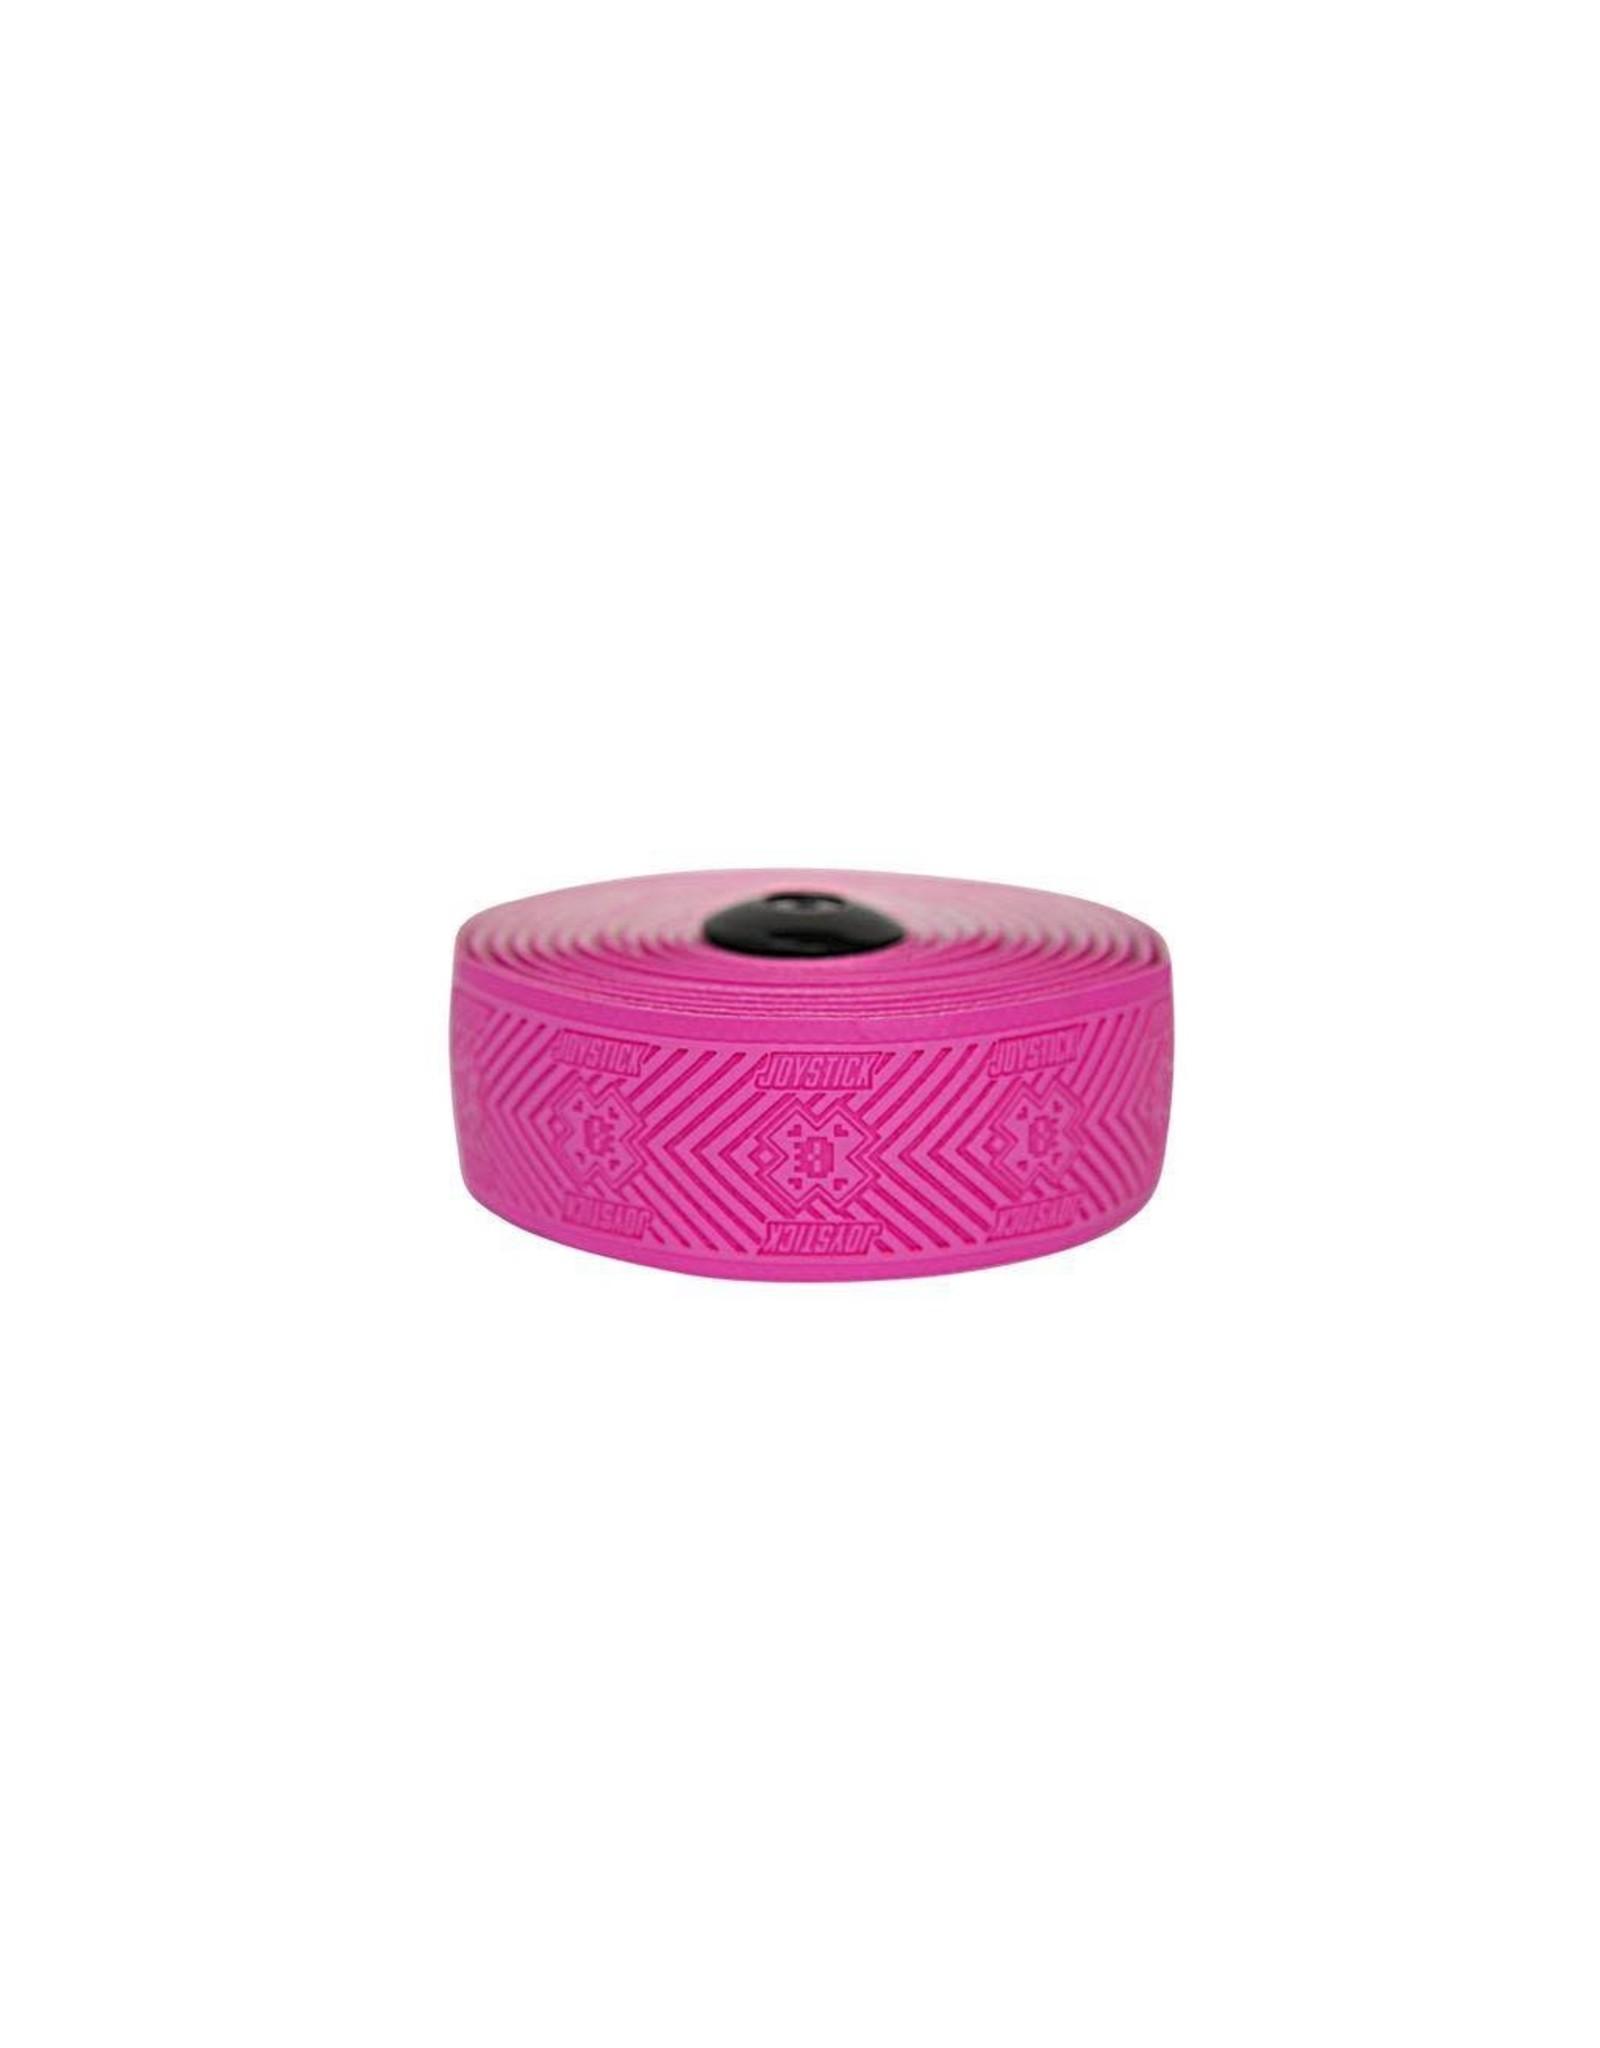 JOY STICK CDR-Joy Stick Analog Bar Tape 2.8mm PINK